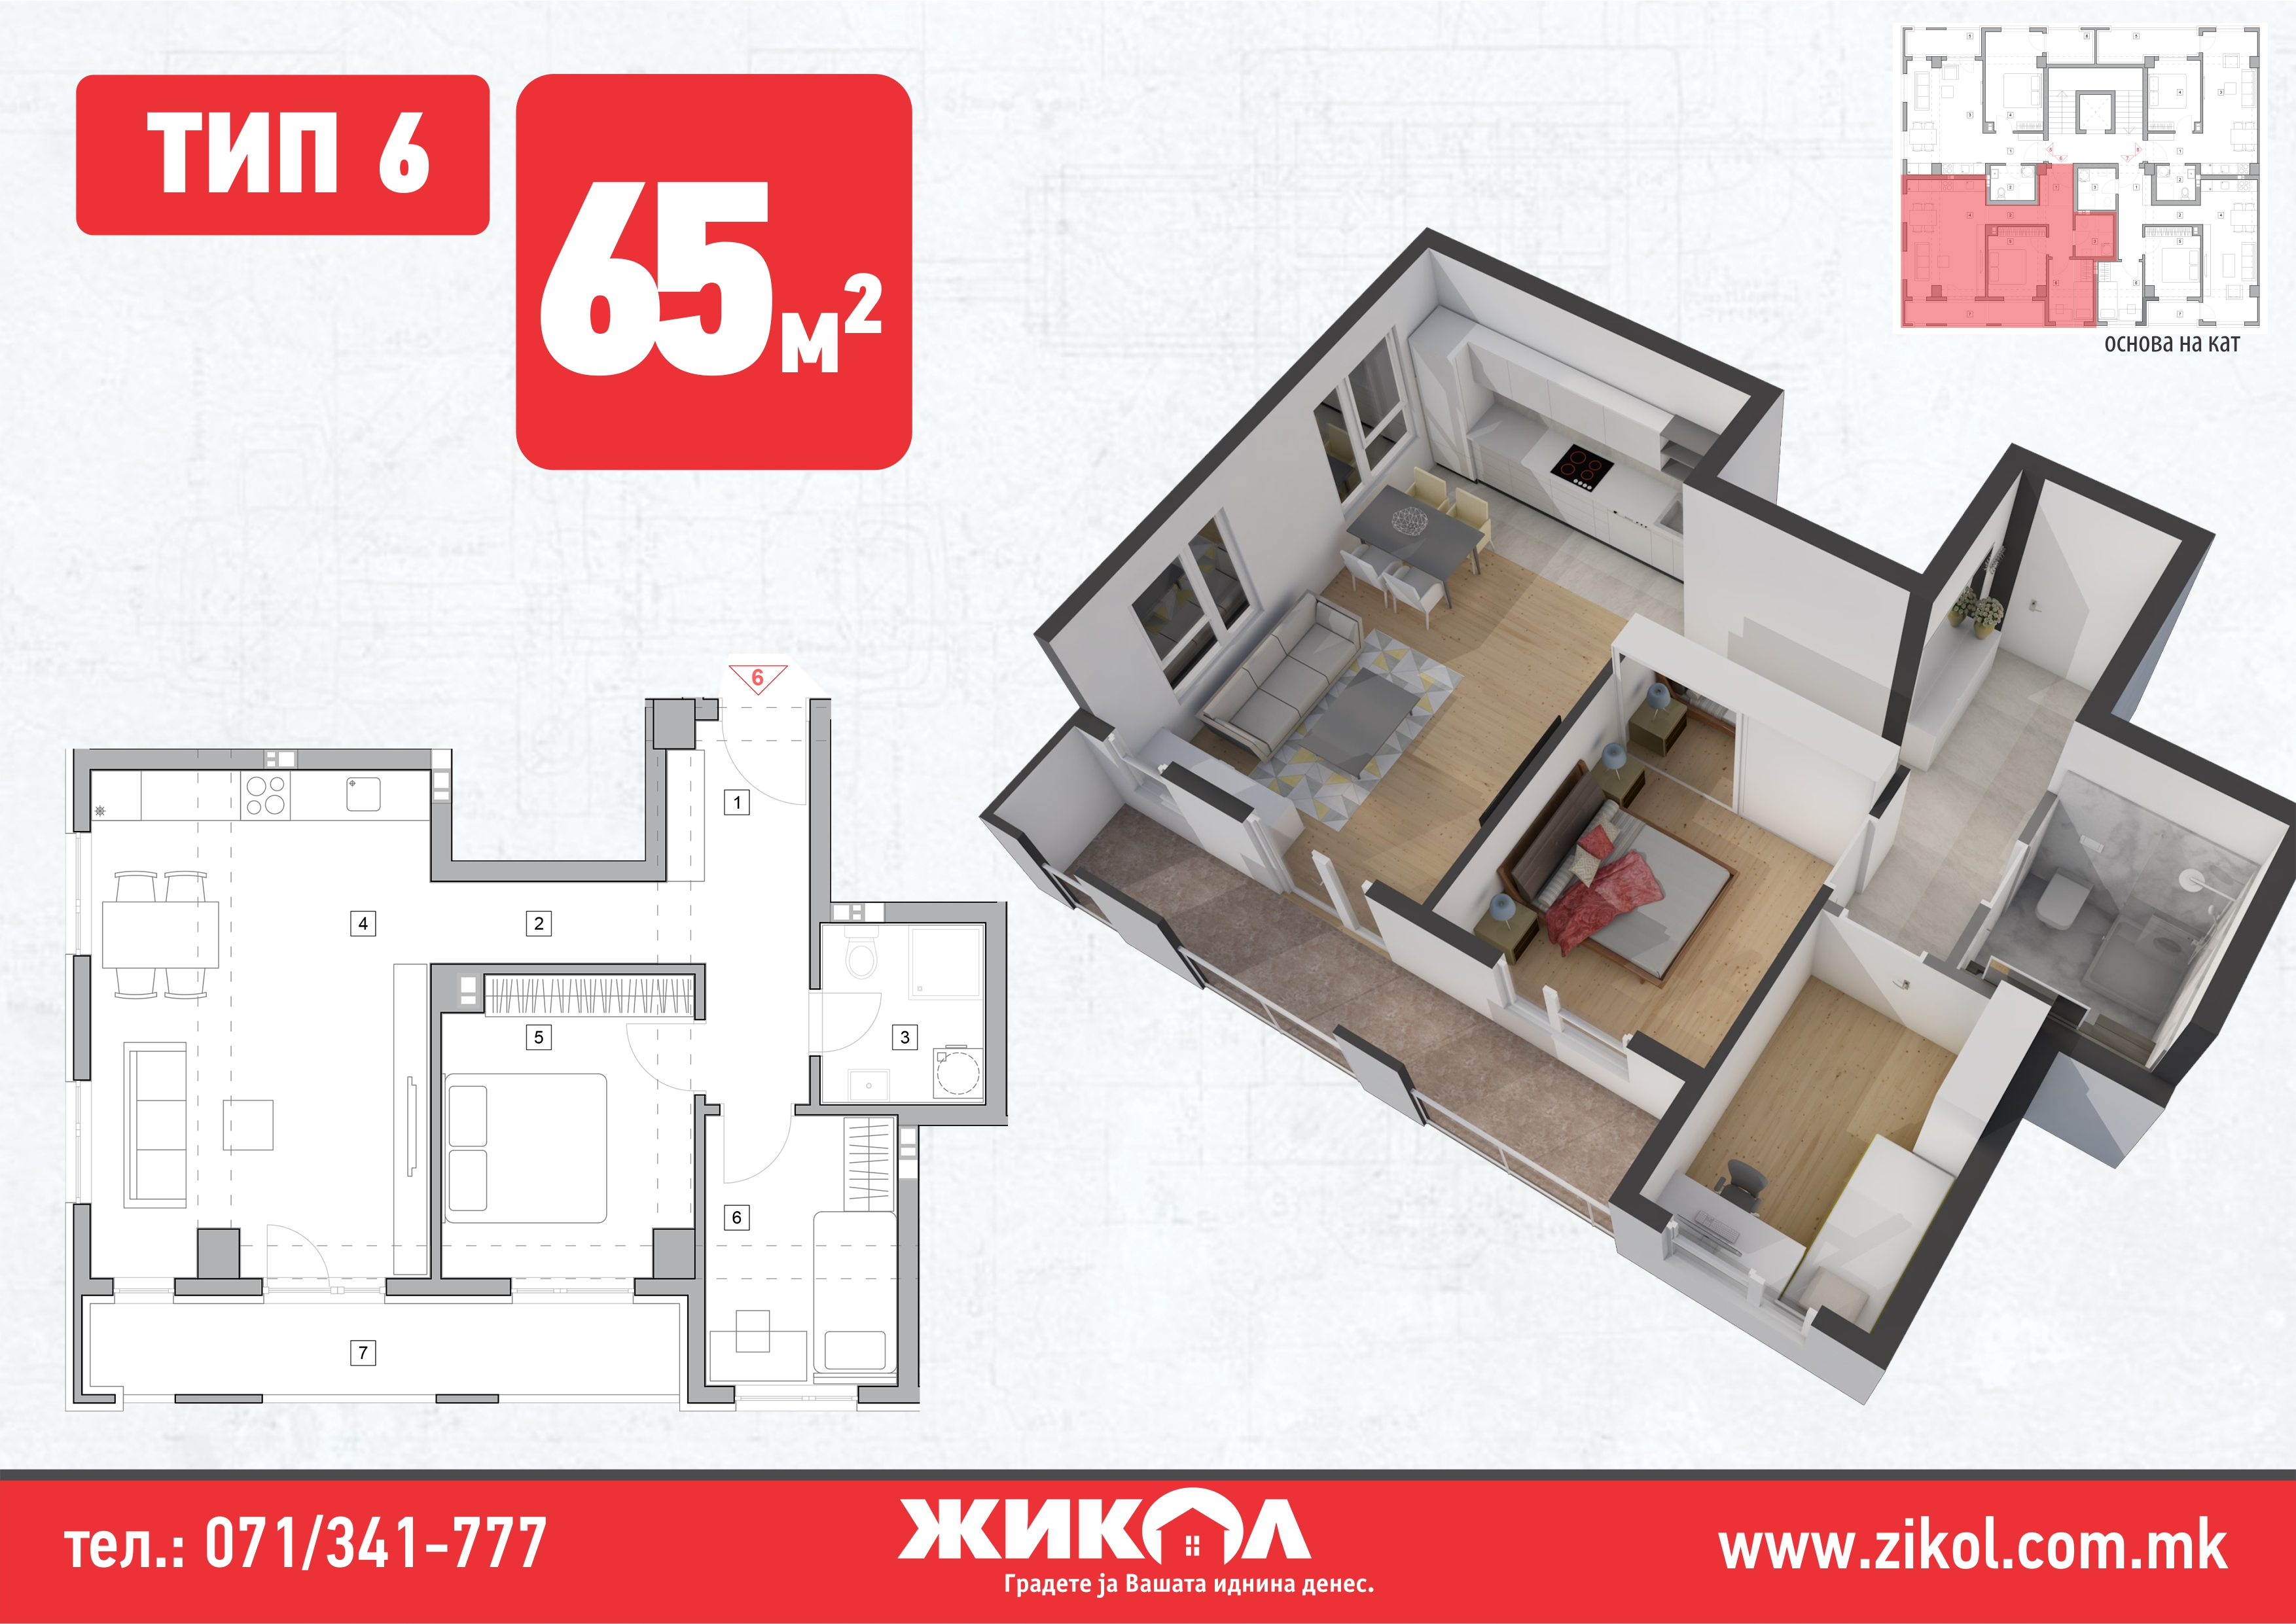 зграда 8, кат 2, стан 10